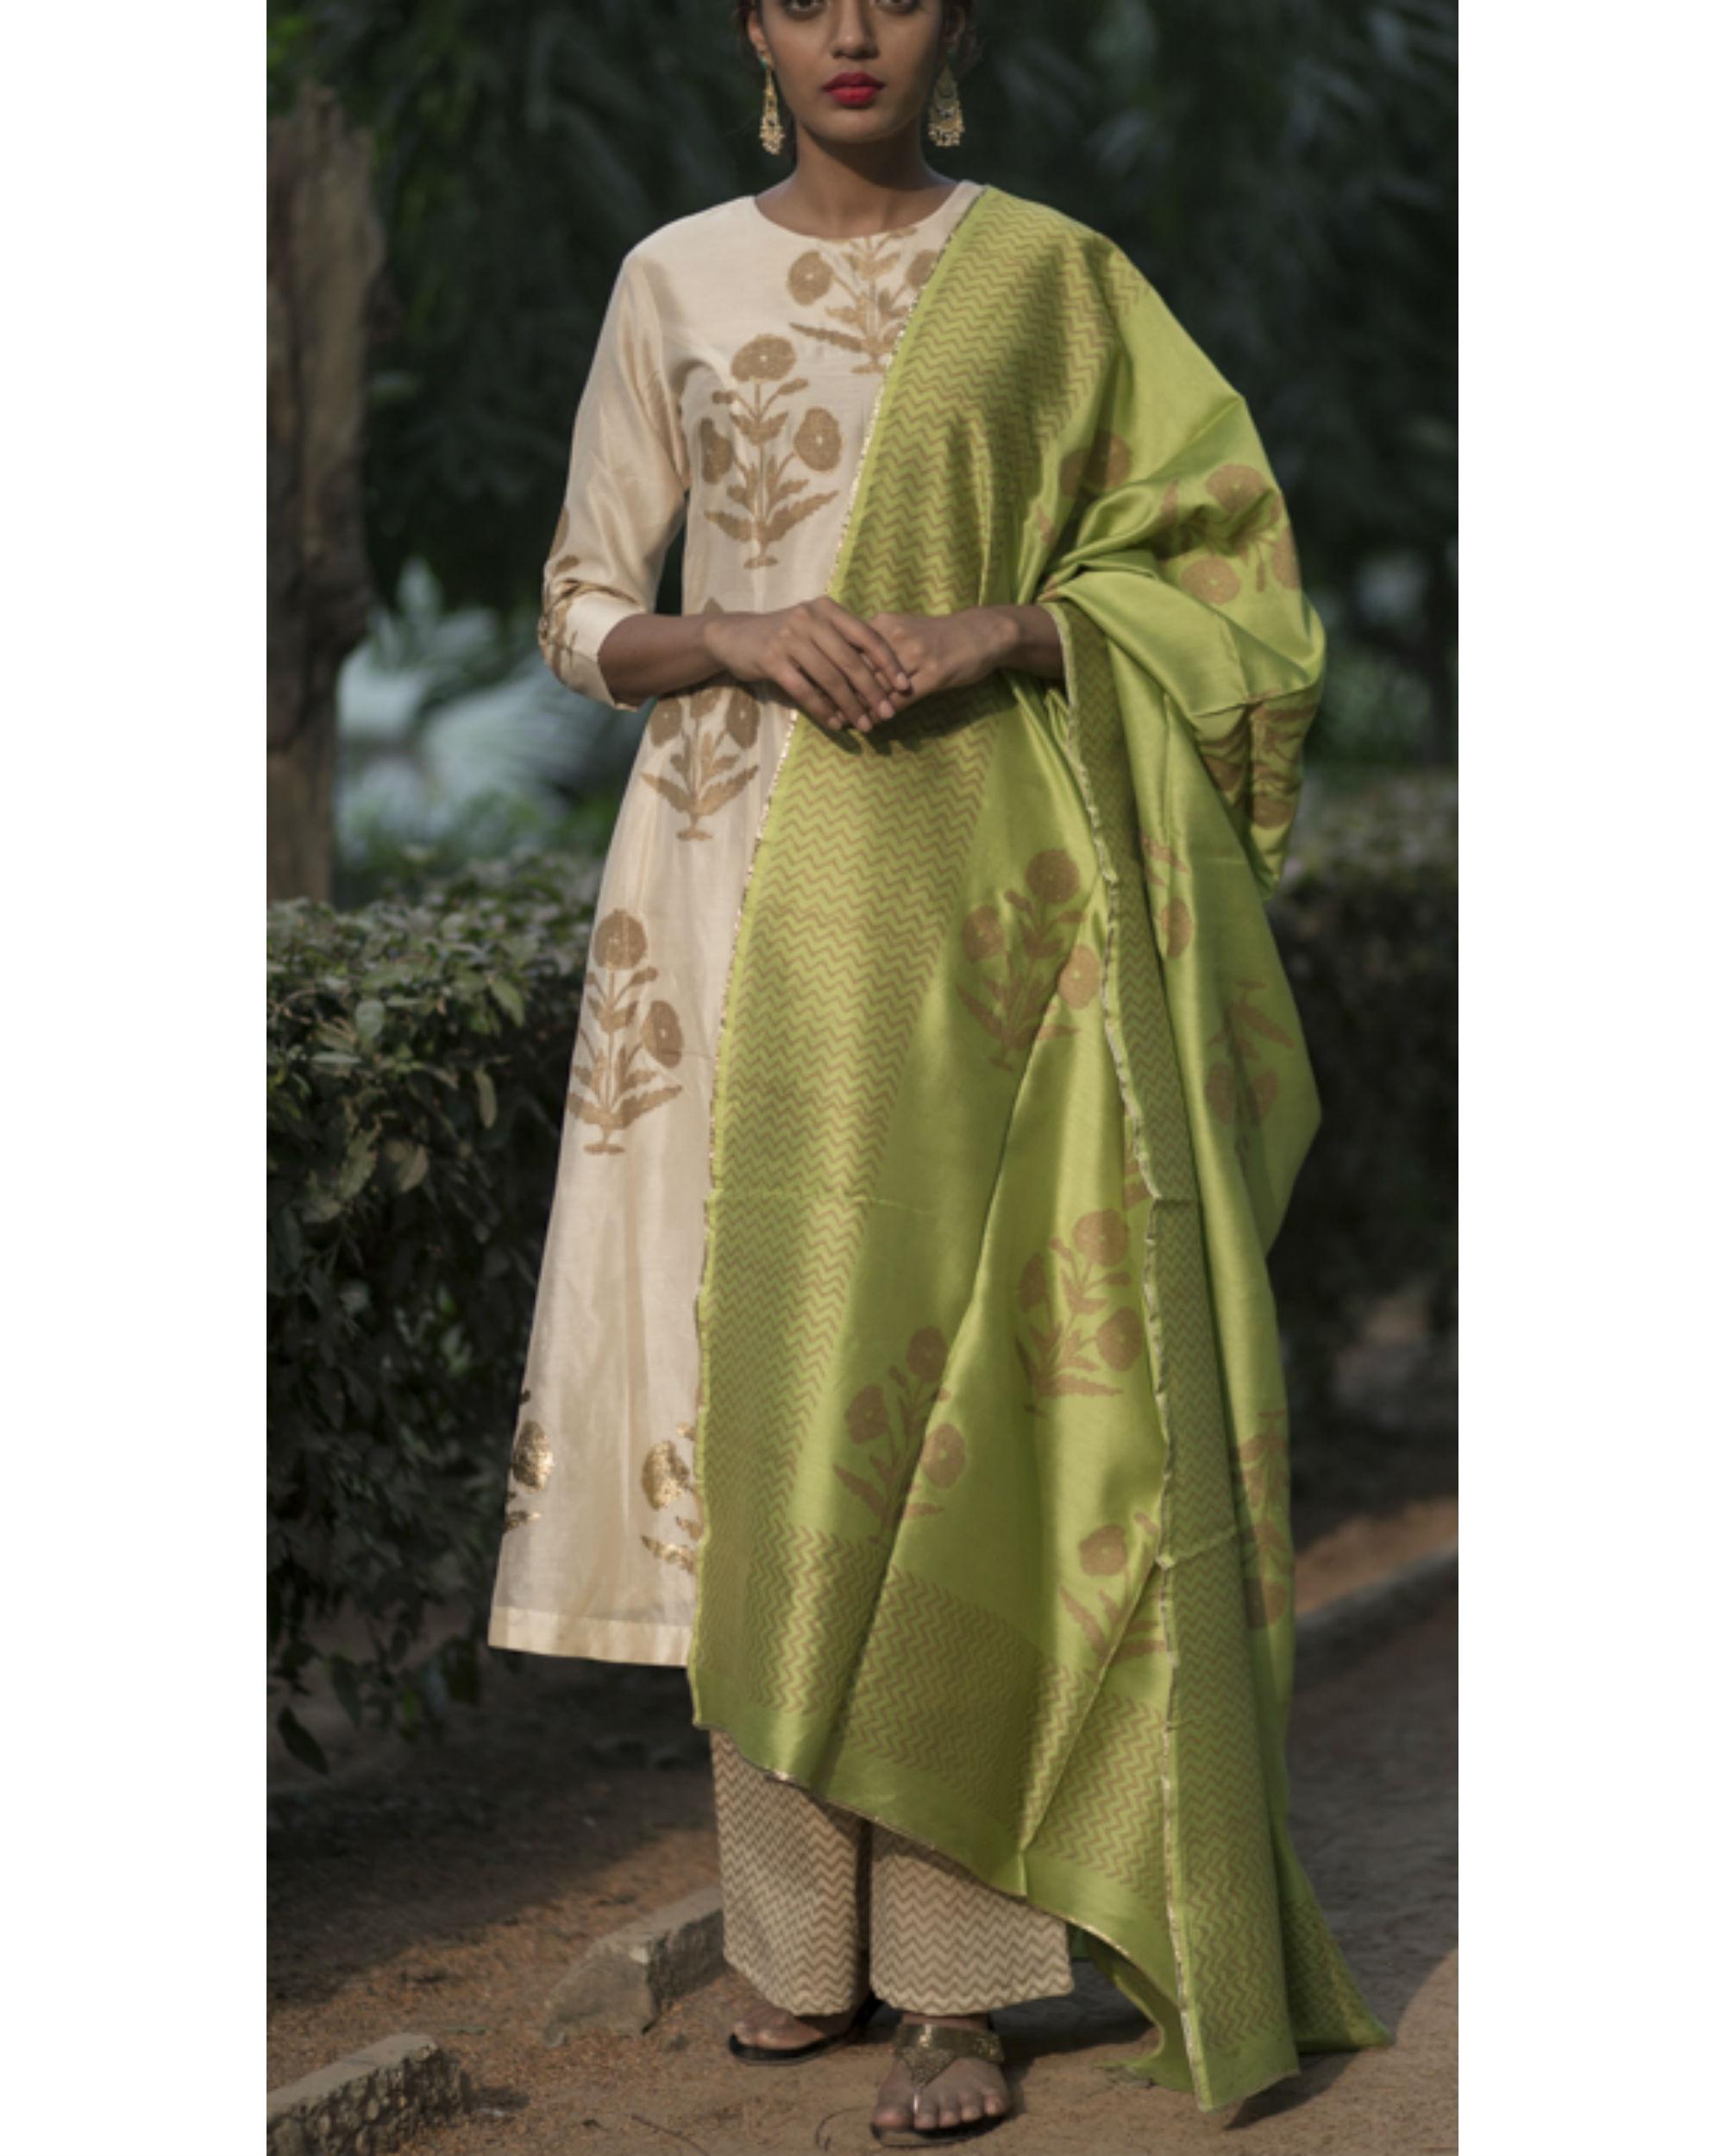 Chandaniya phool printed kurta set with noori green block printed dupatta